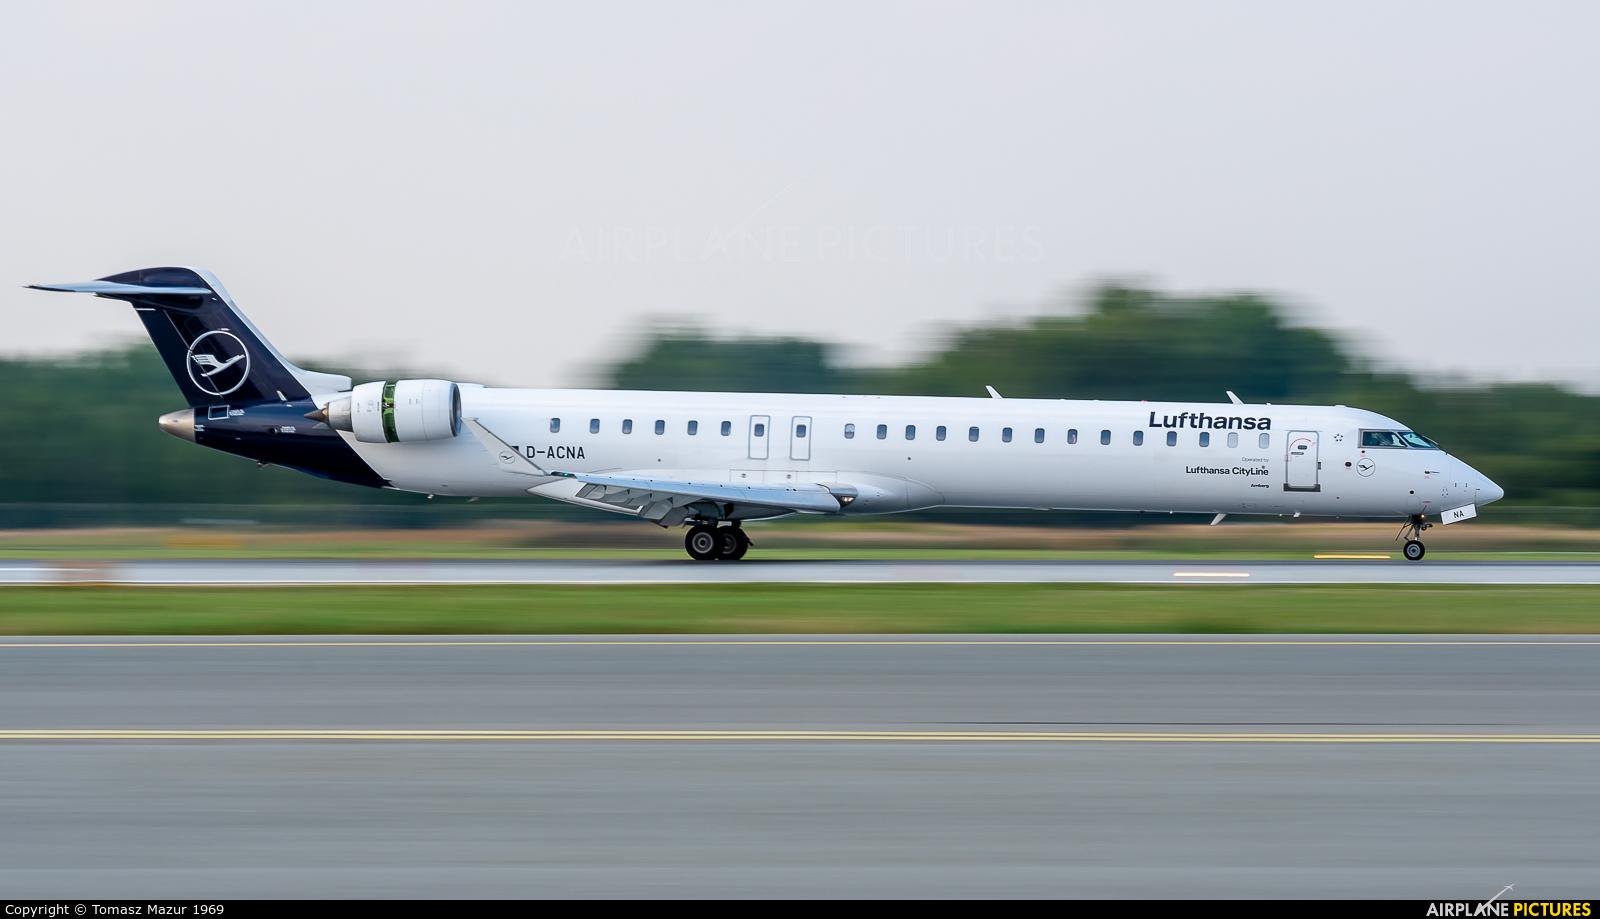 Lufthansa Regional - CityLine D-ACNA aircraft at Katowice - Pyrzowice